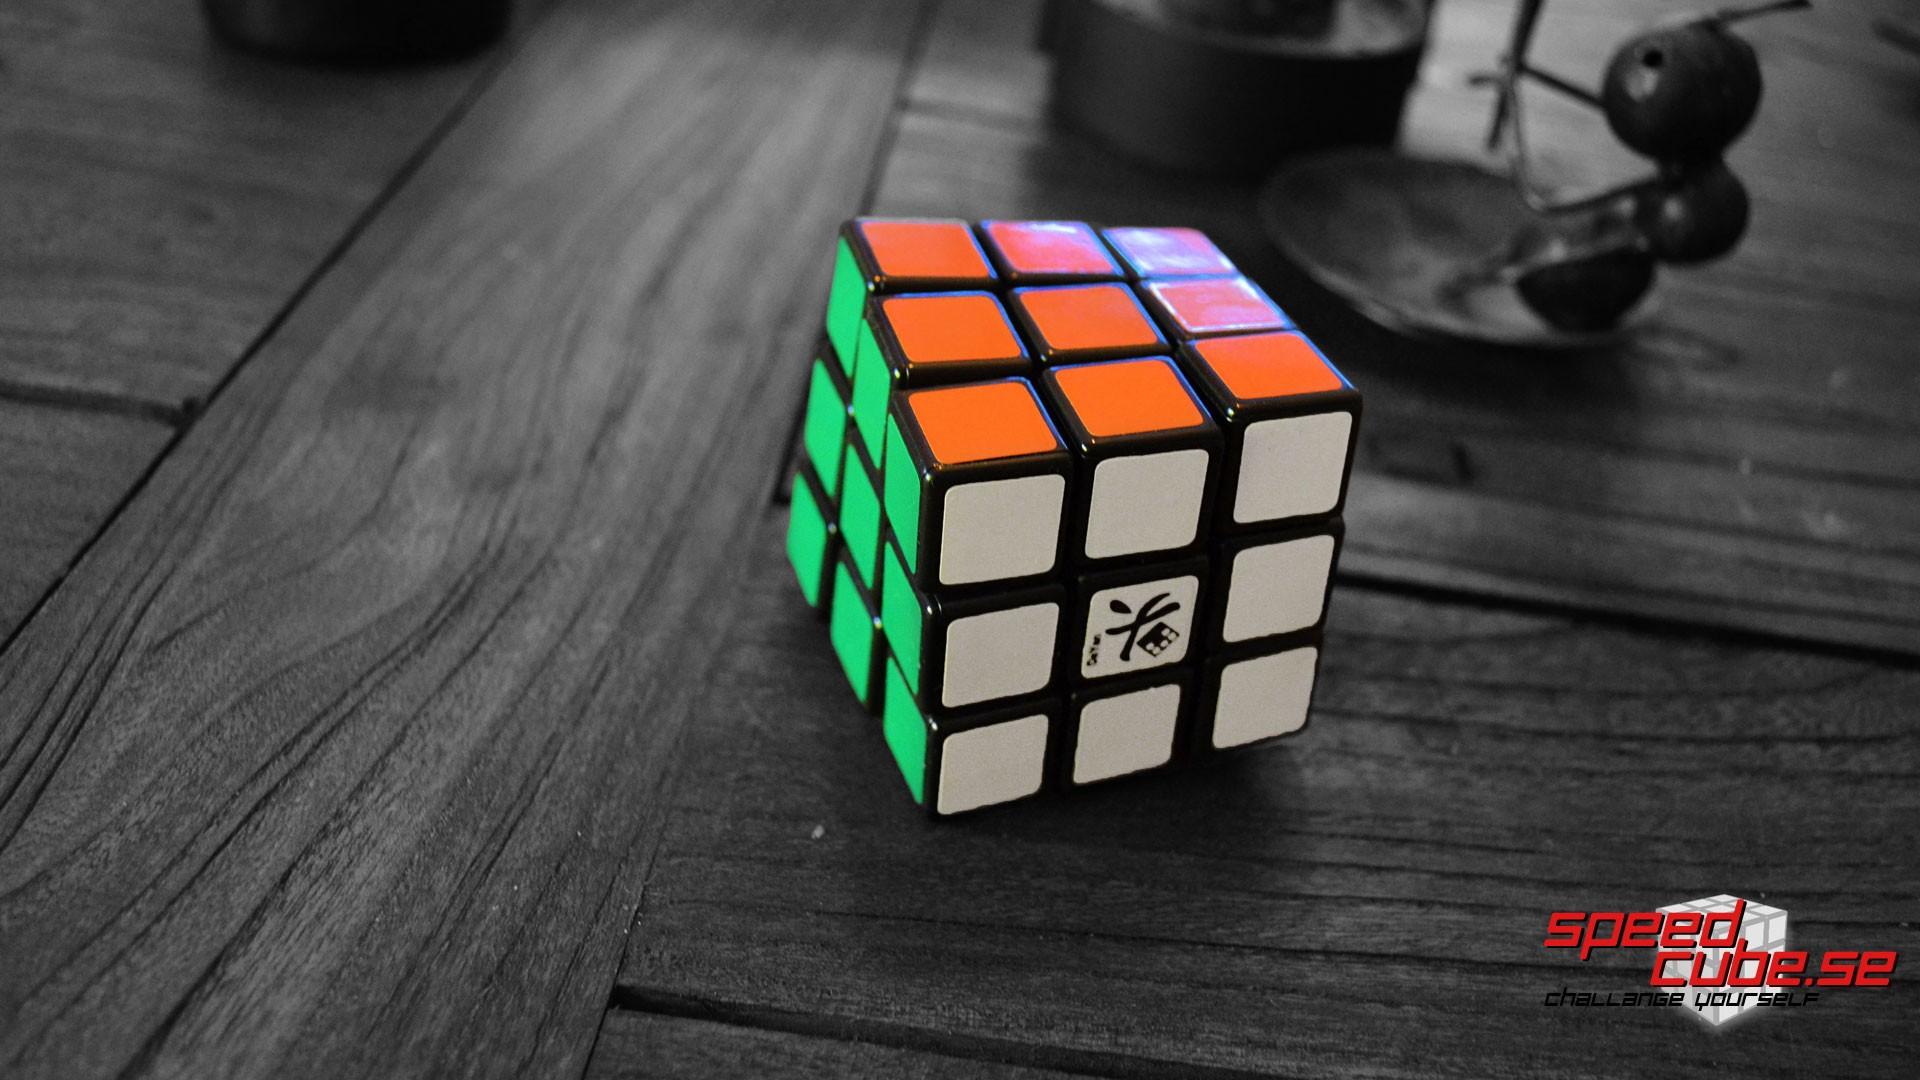 Rubiks Cube Wallpaper 1920x1080 Rubiks Cube Speedcube 1920x1080